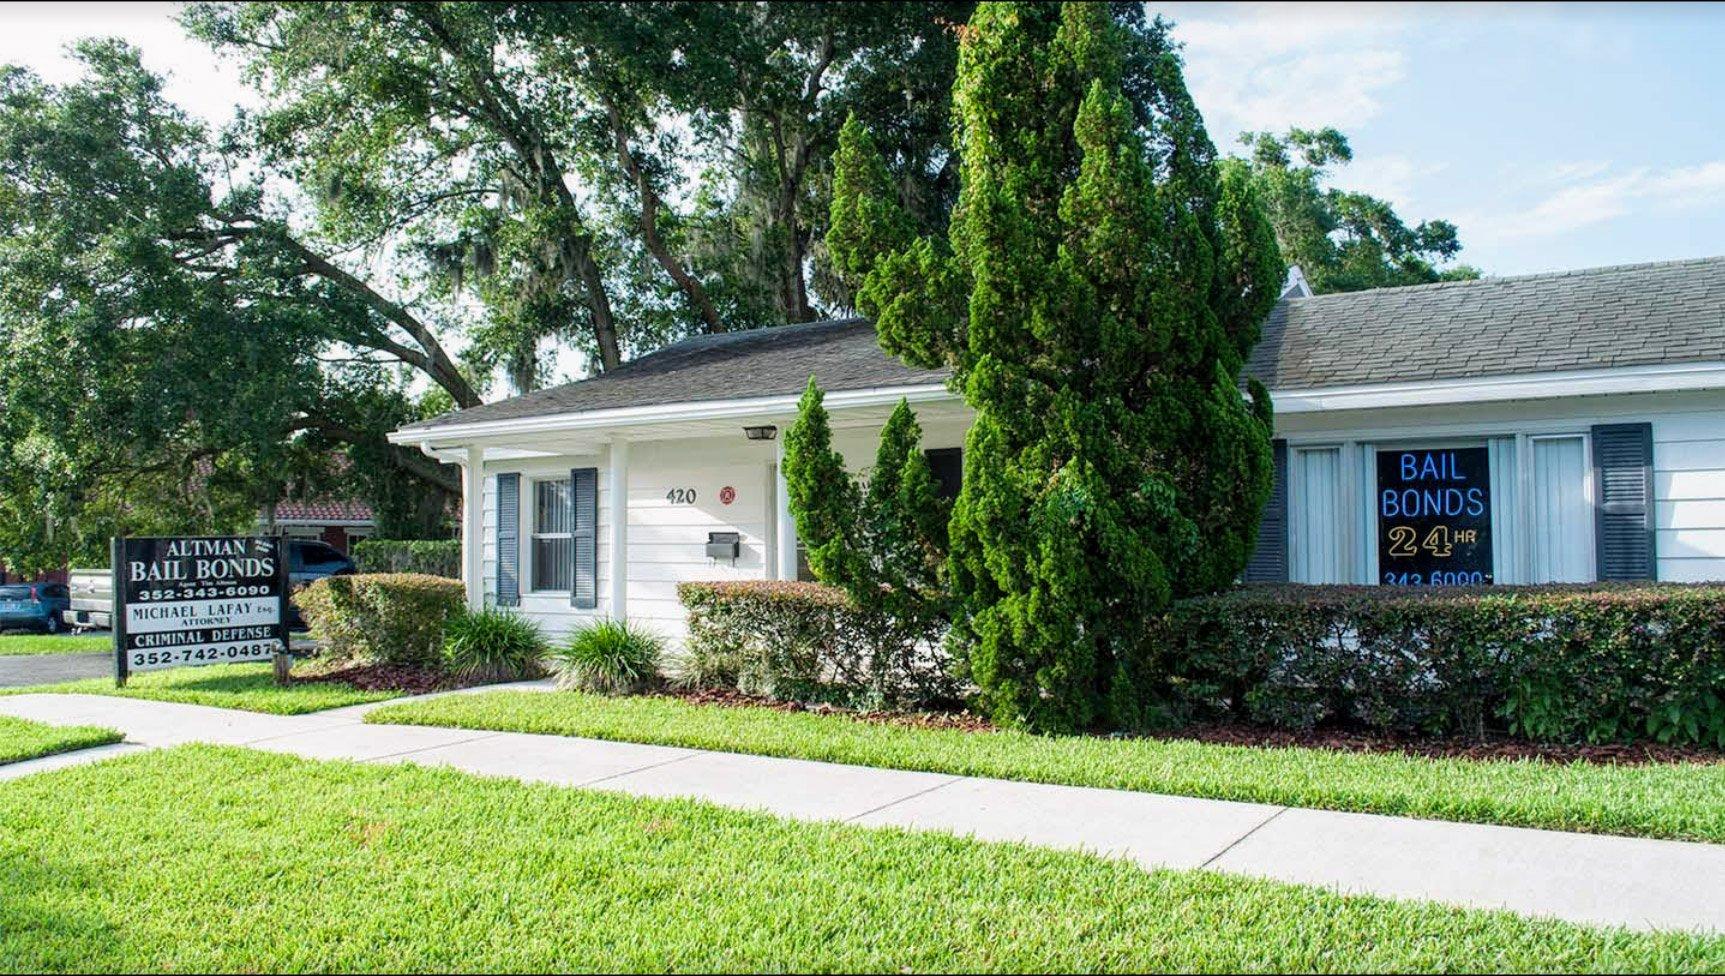 ALTMAN BAIL BONDS Office Location inTavares, FL